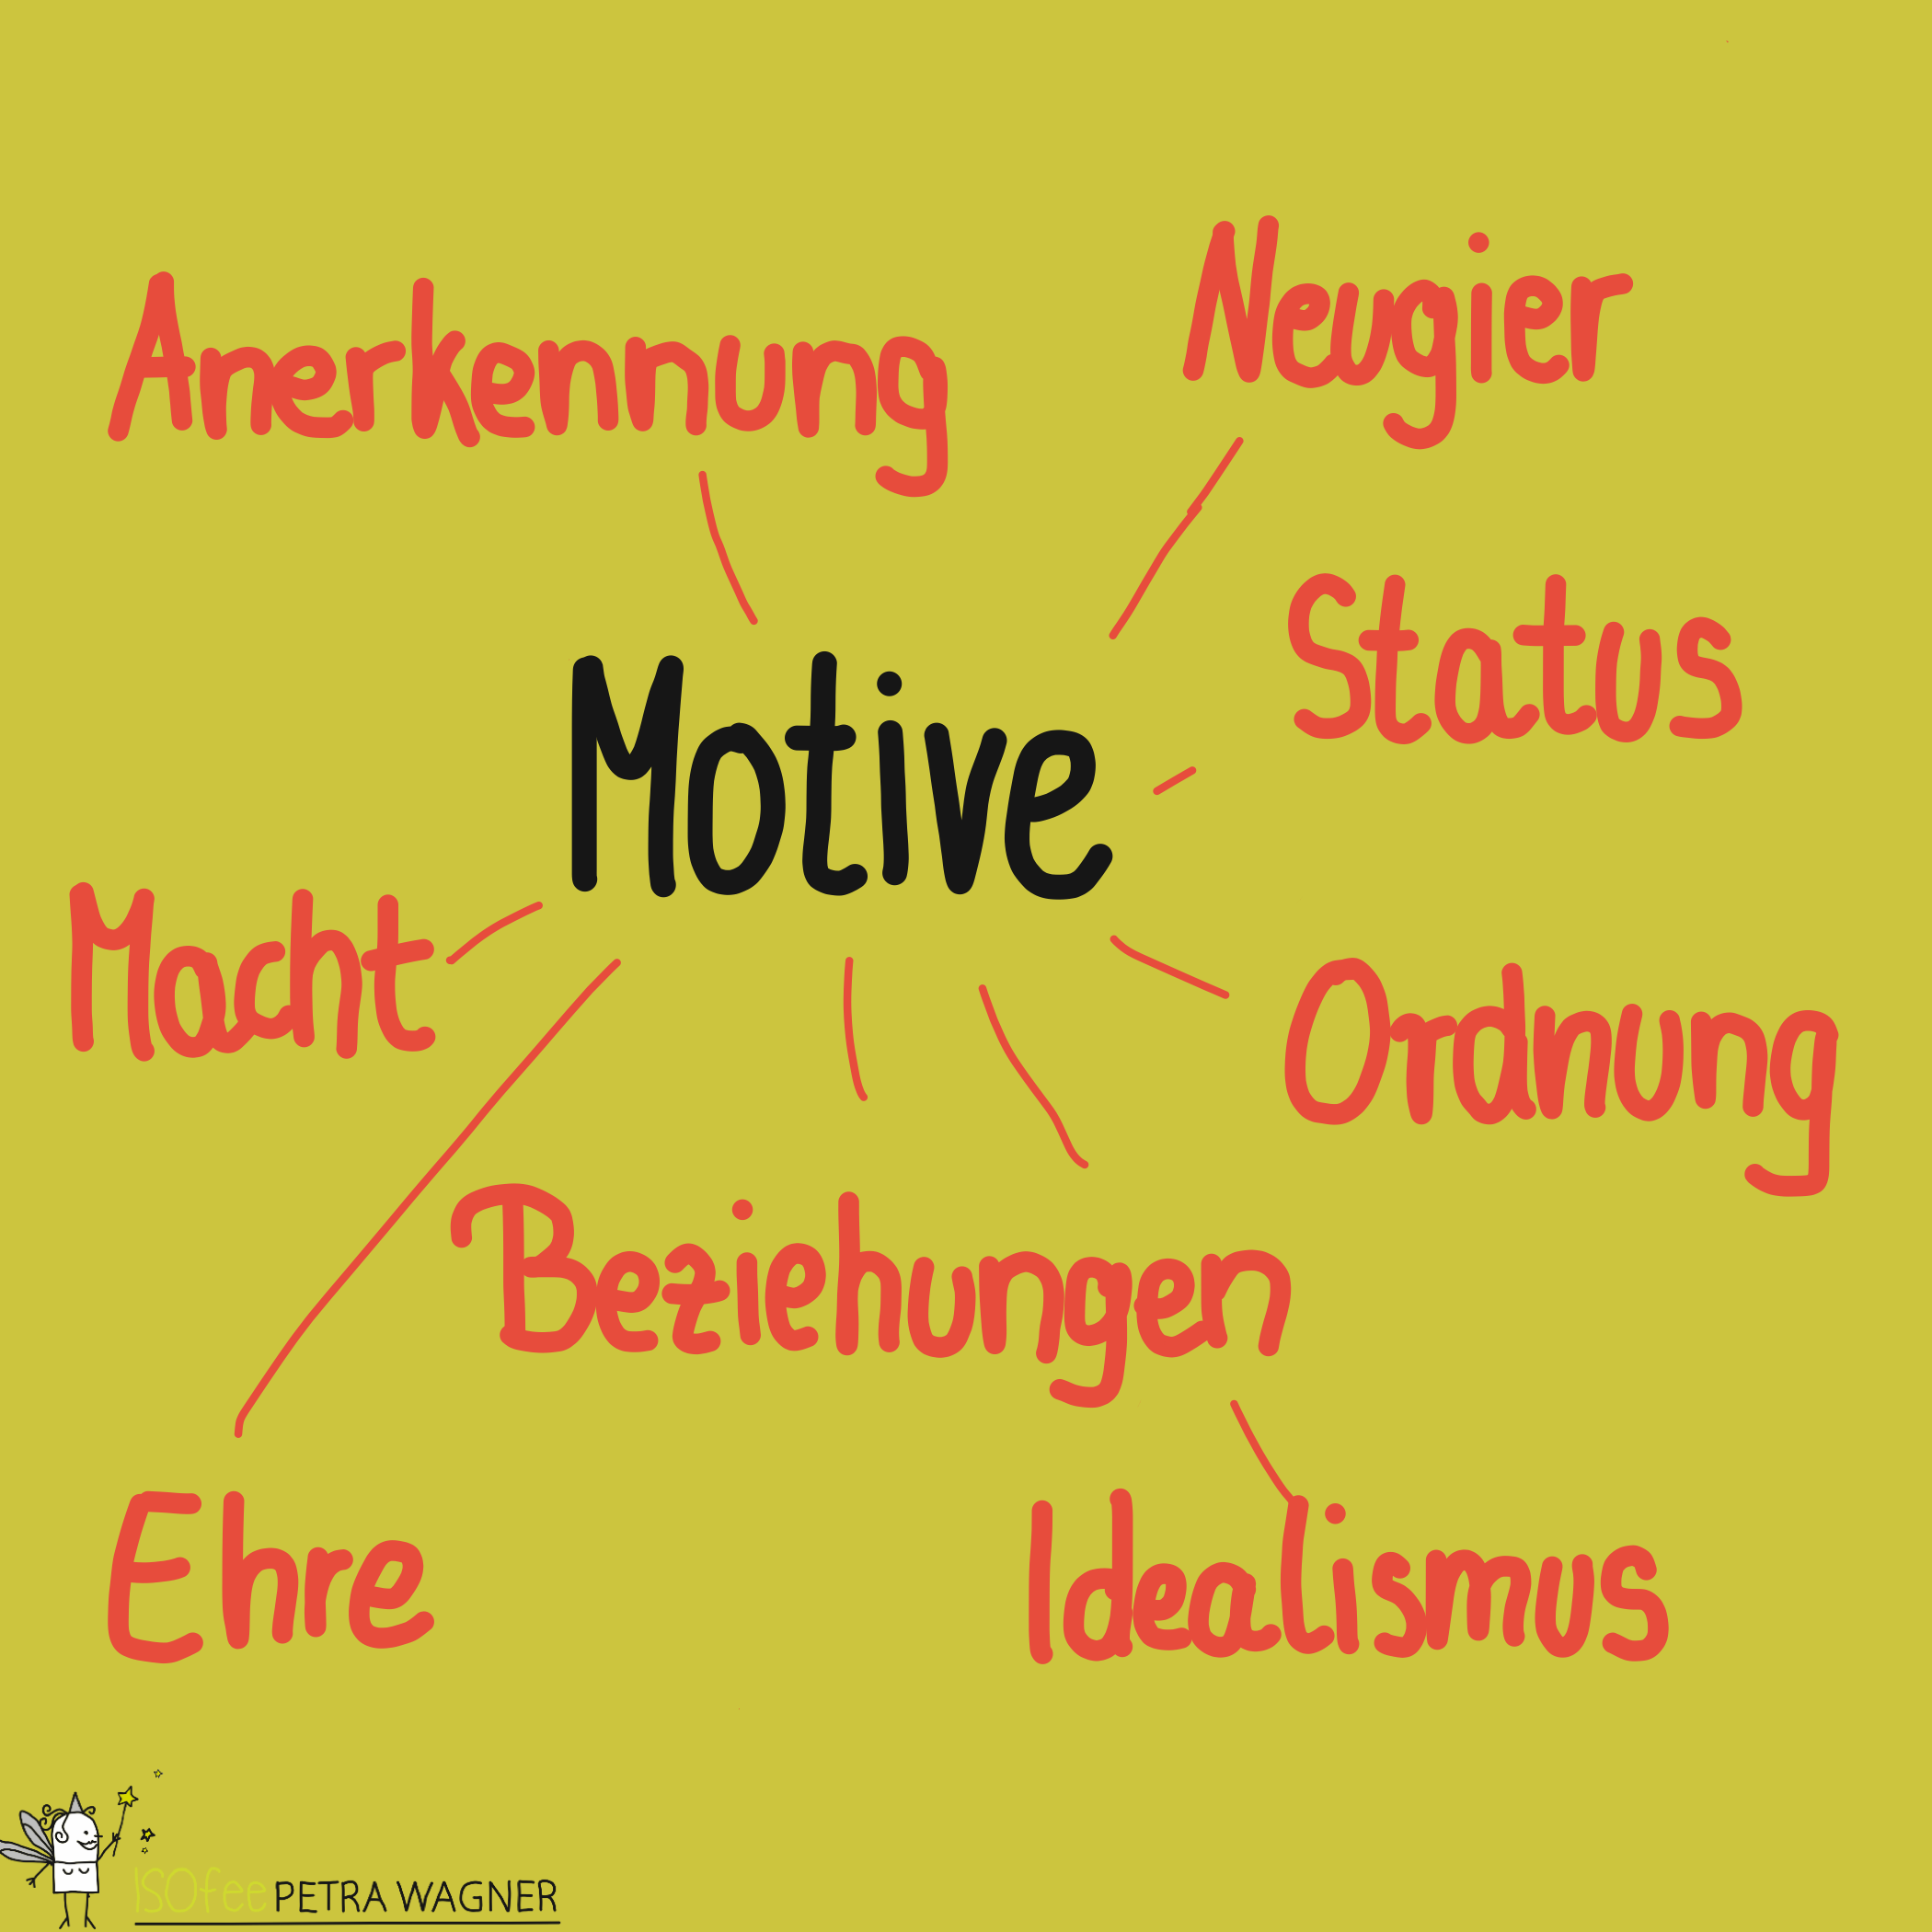 Motive - ISOfee